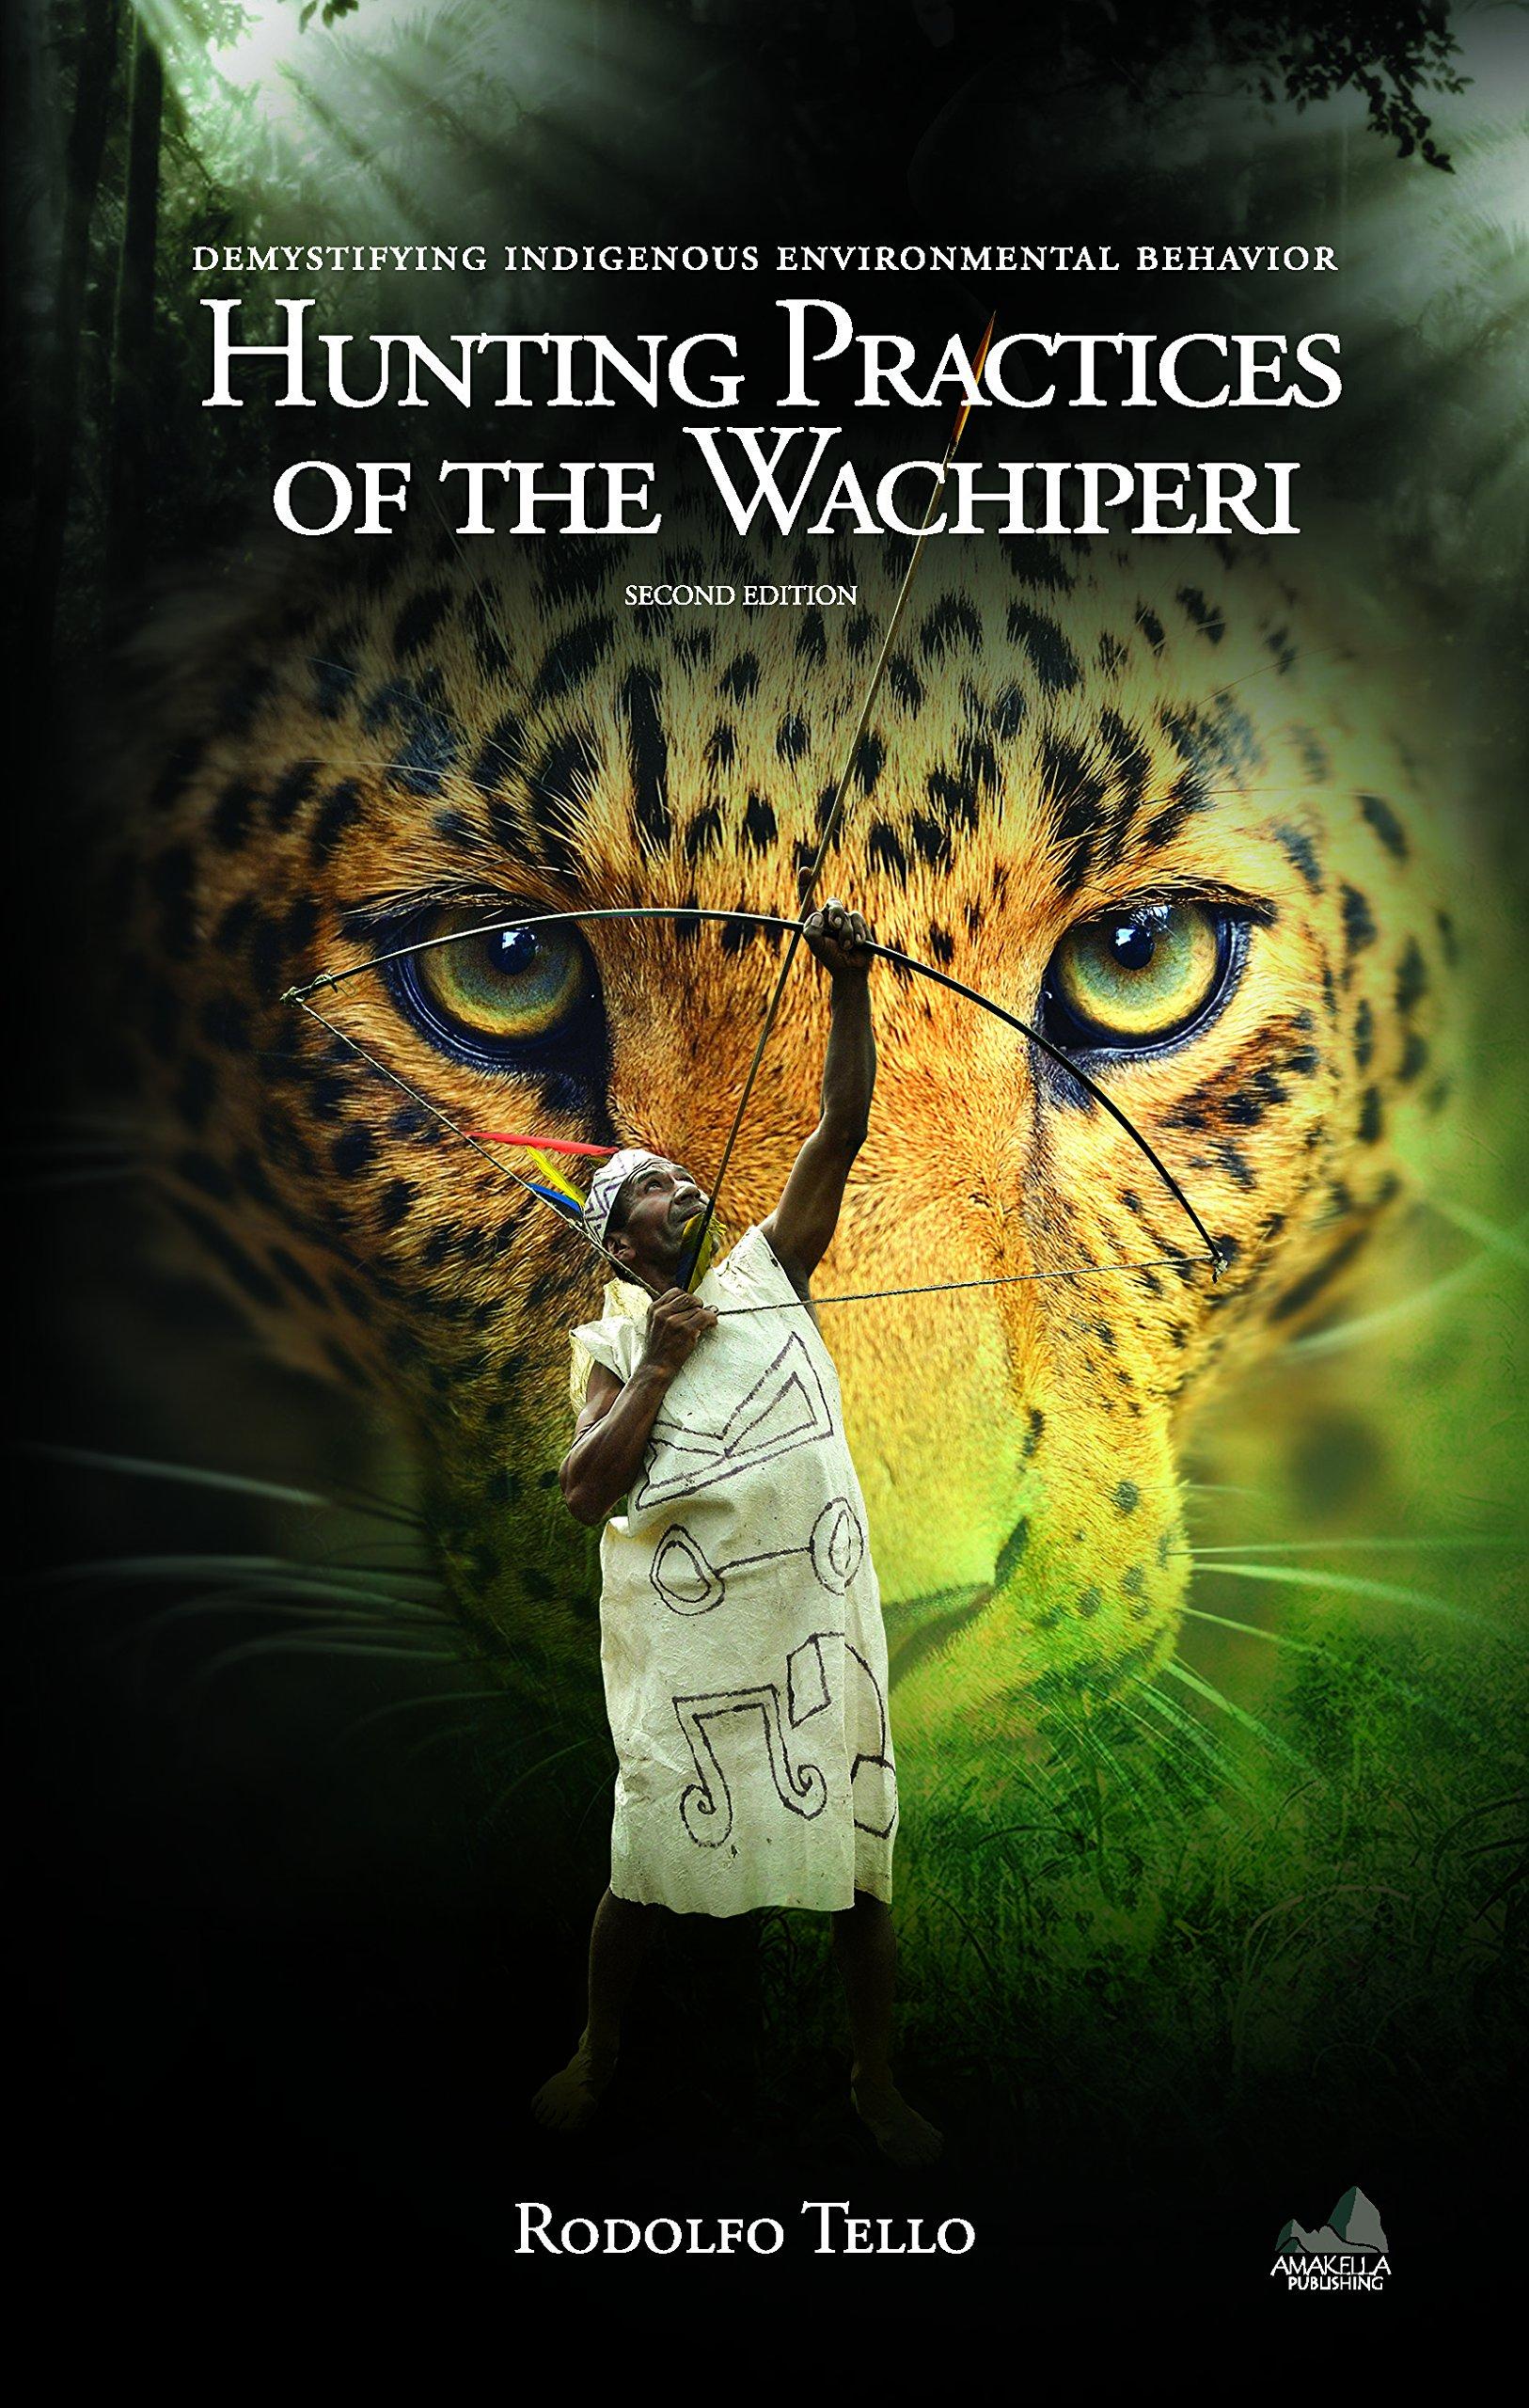 Hunting Practices of the Wachiperi: Demystifying Indigenous Environmental Behavior (Environmental Sustainability) PDF